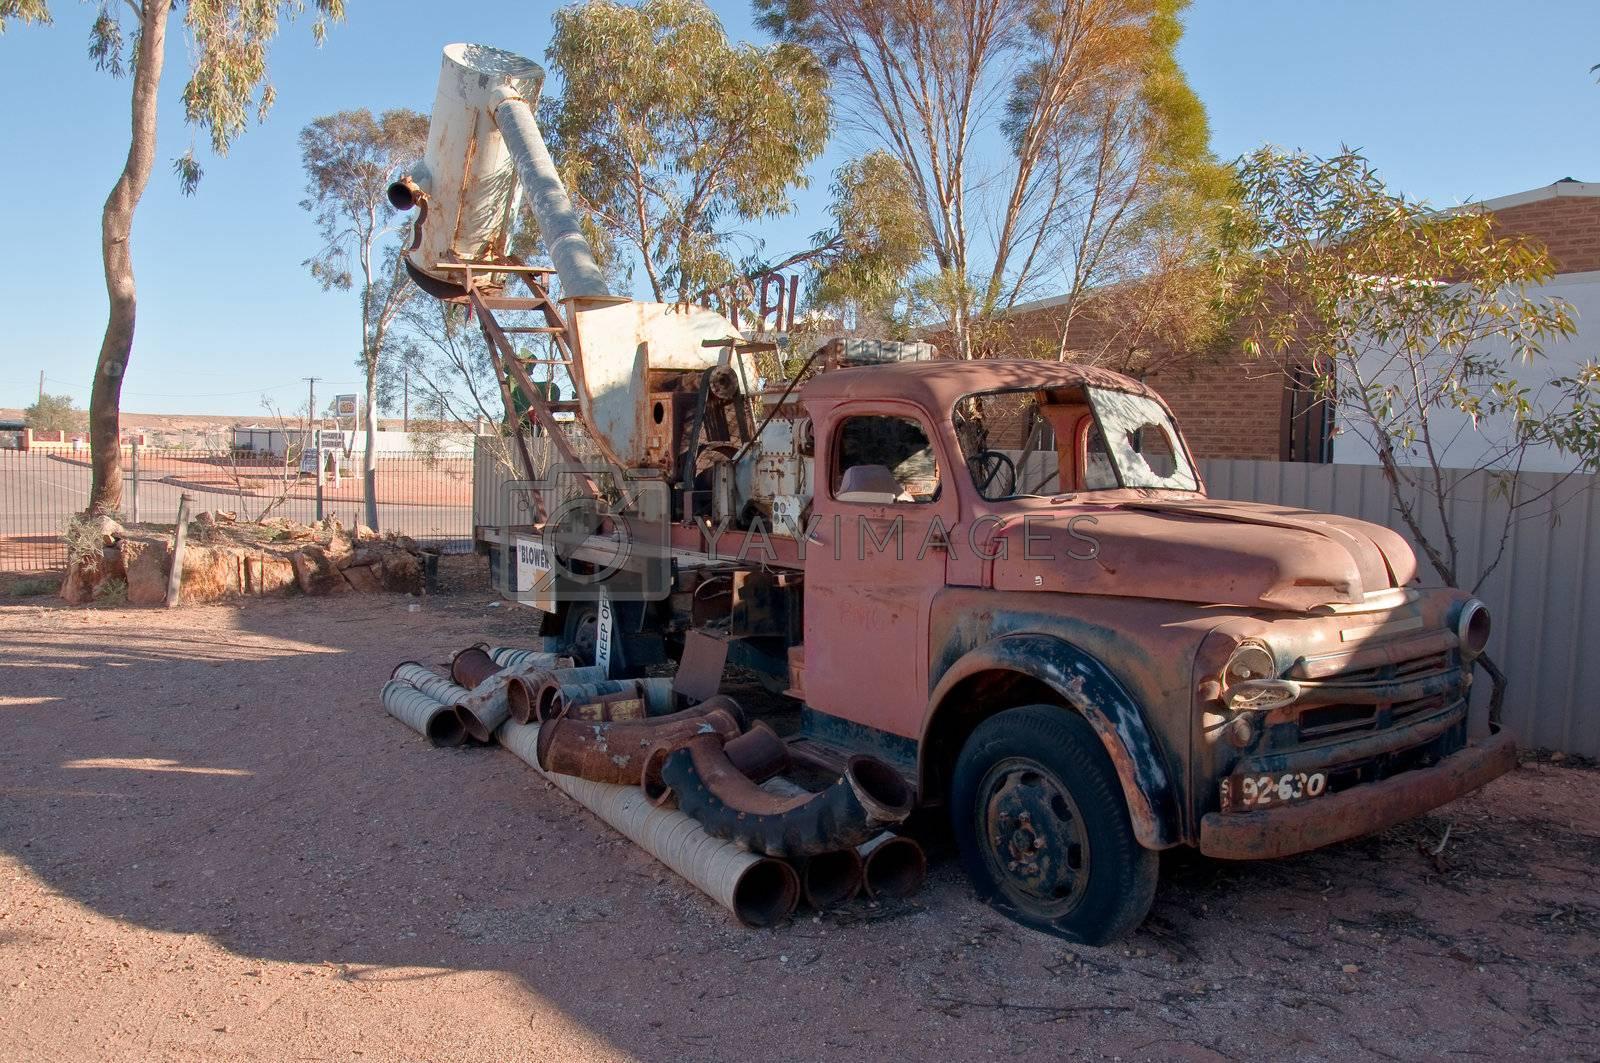 wreck car in Coober Pedy, australia outback south australia